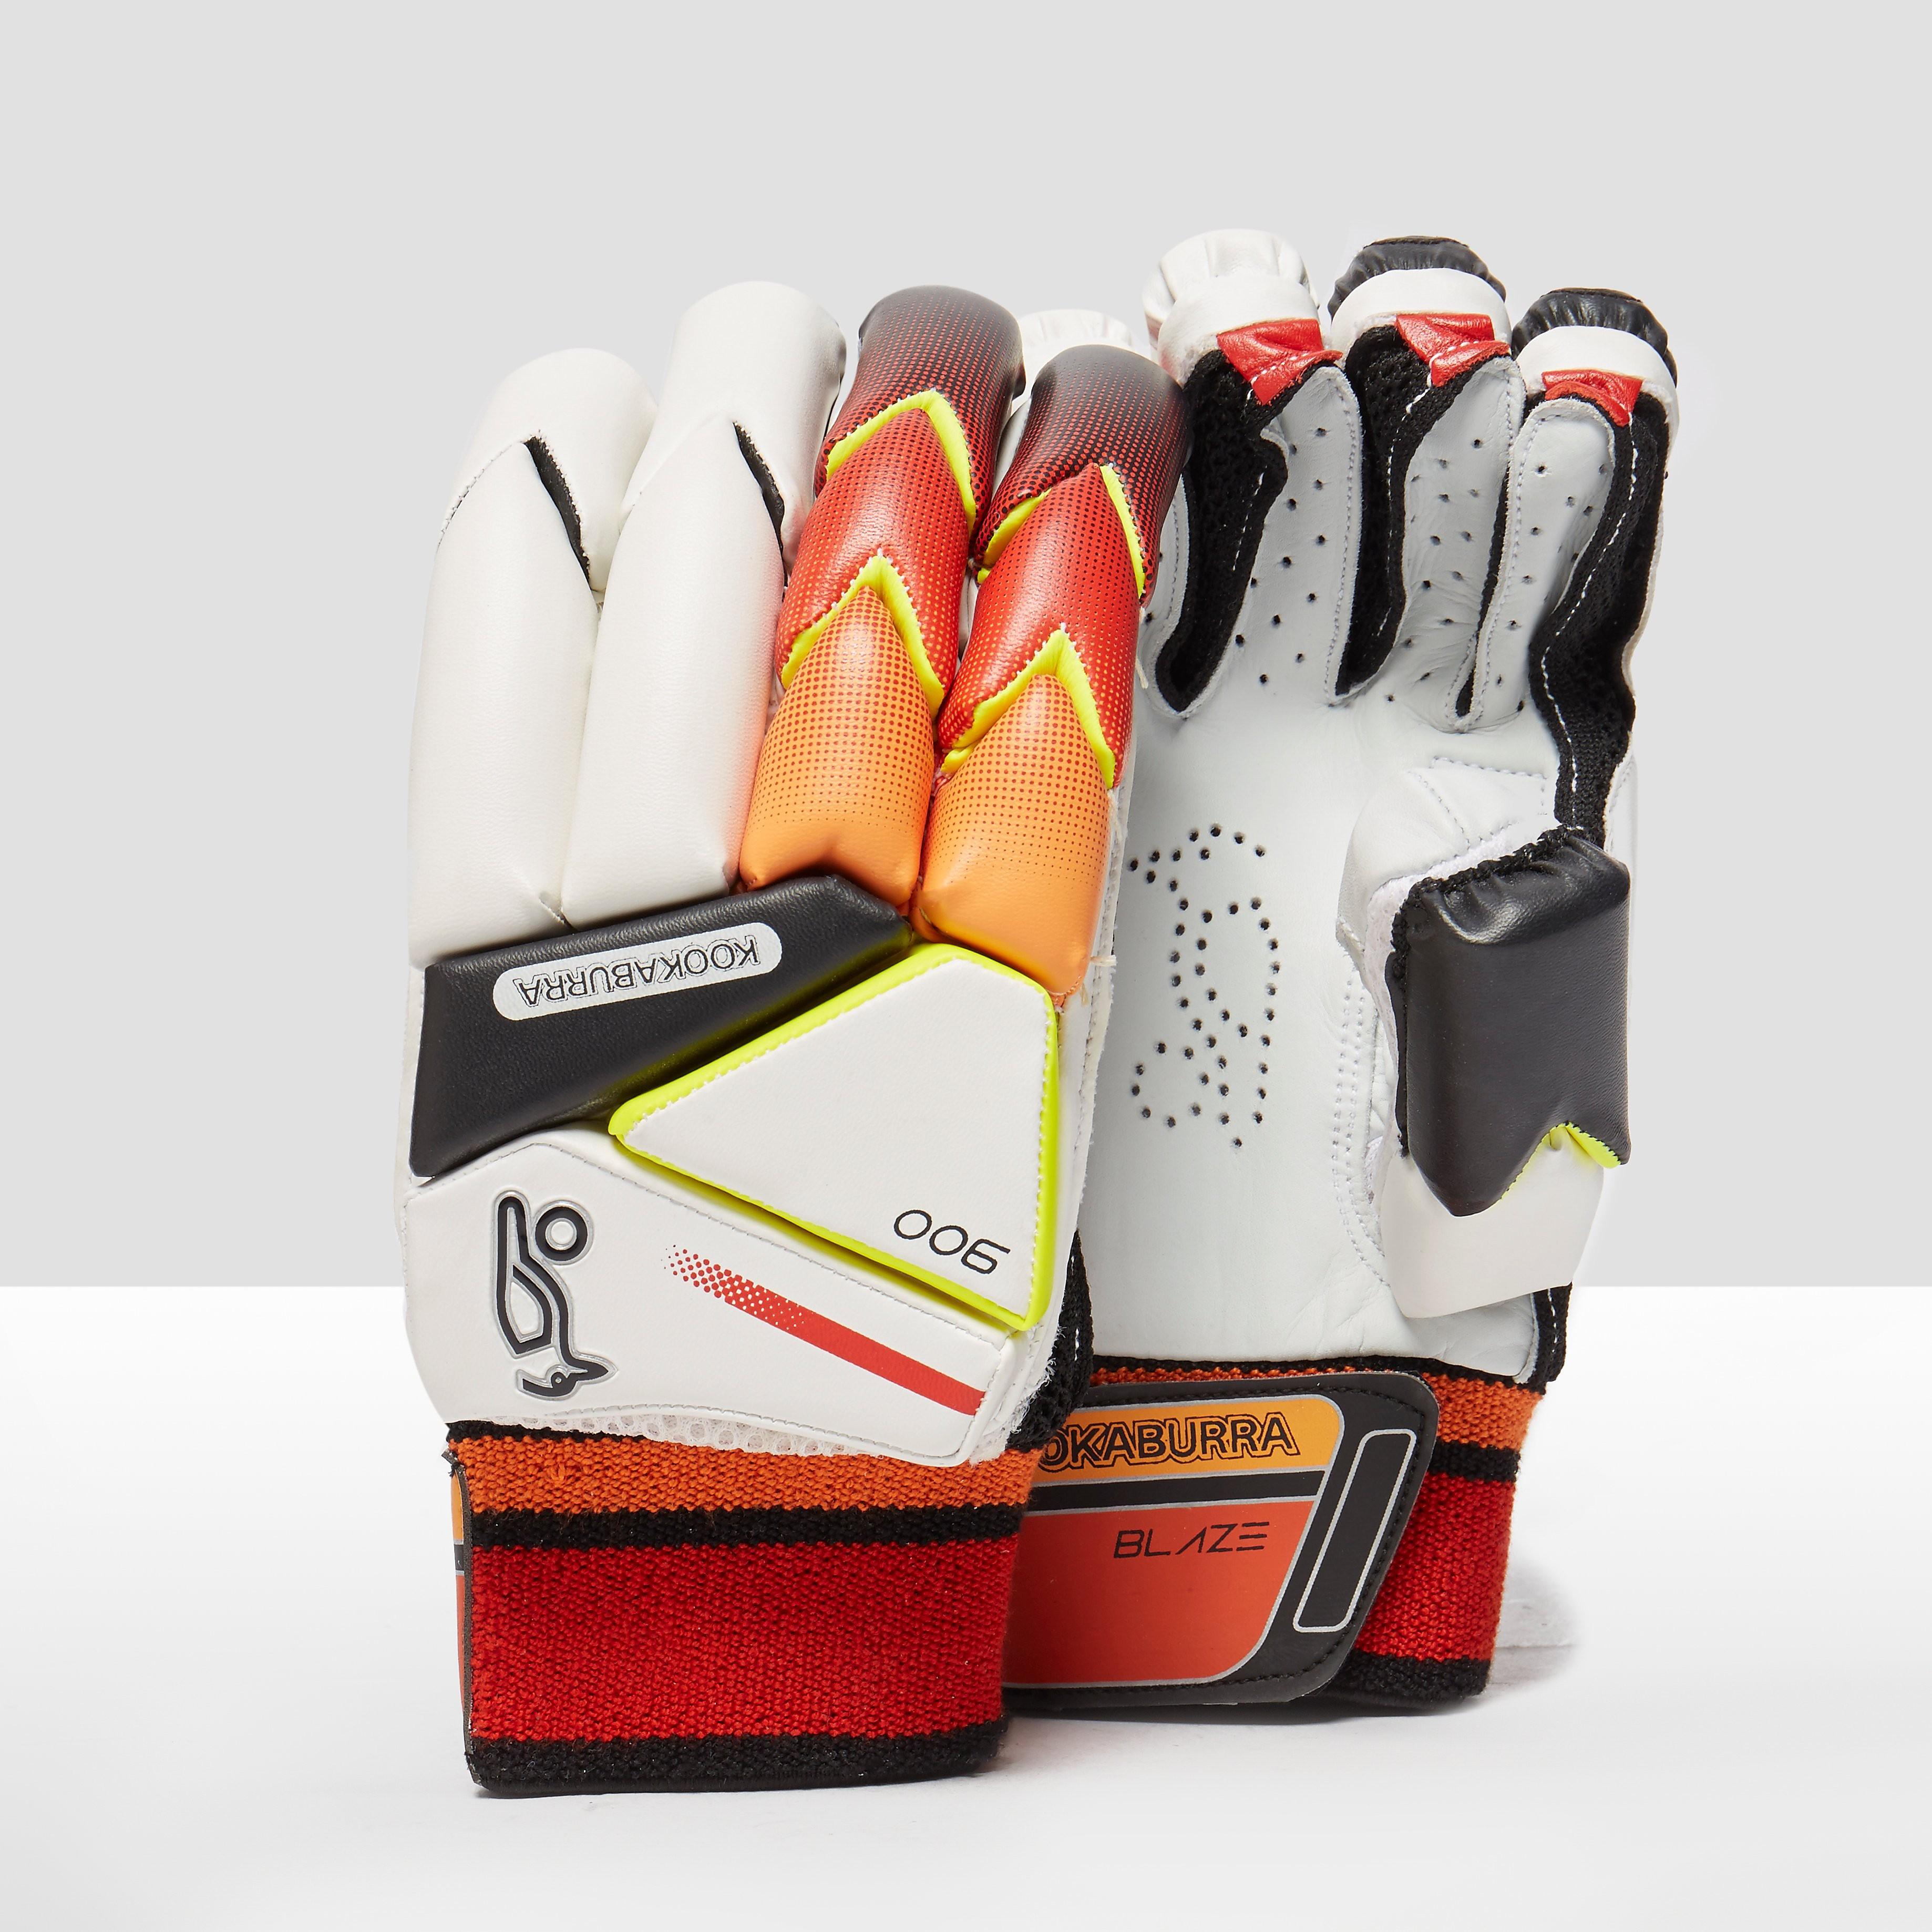 Kookaburra Blaze 900 Junior Batting Gloves